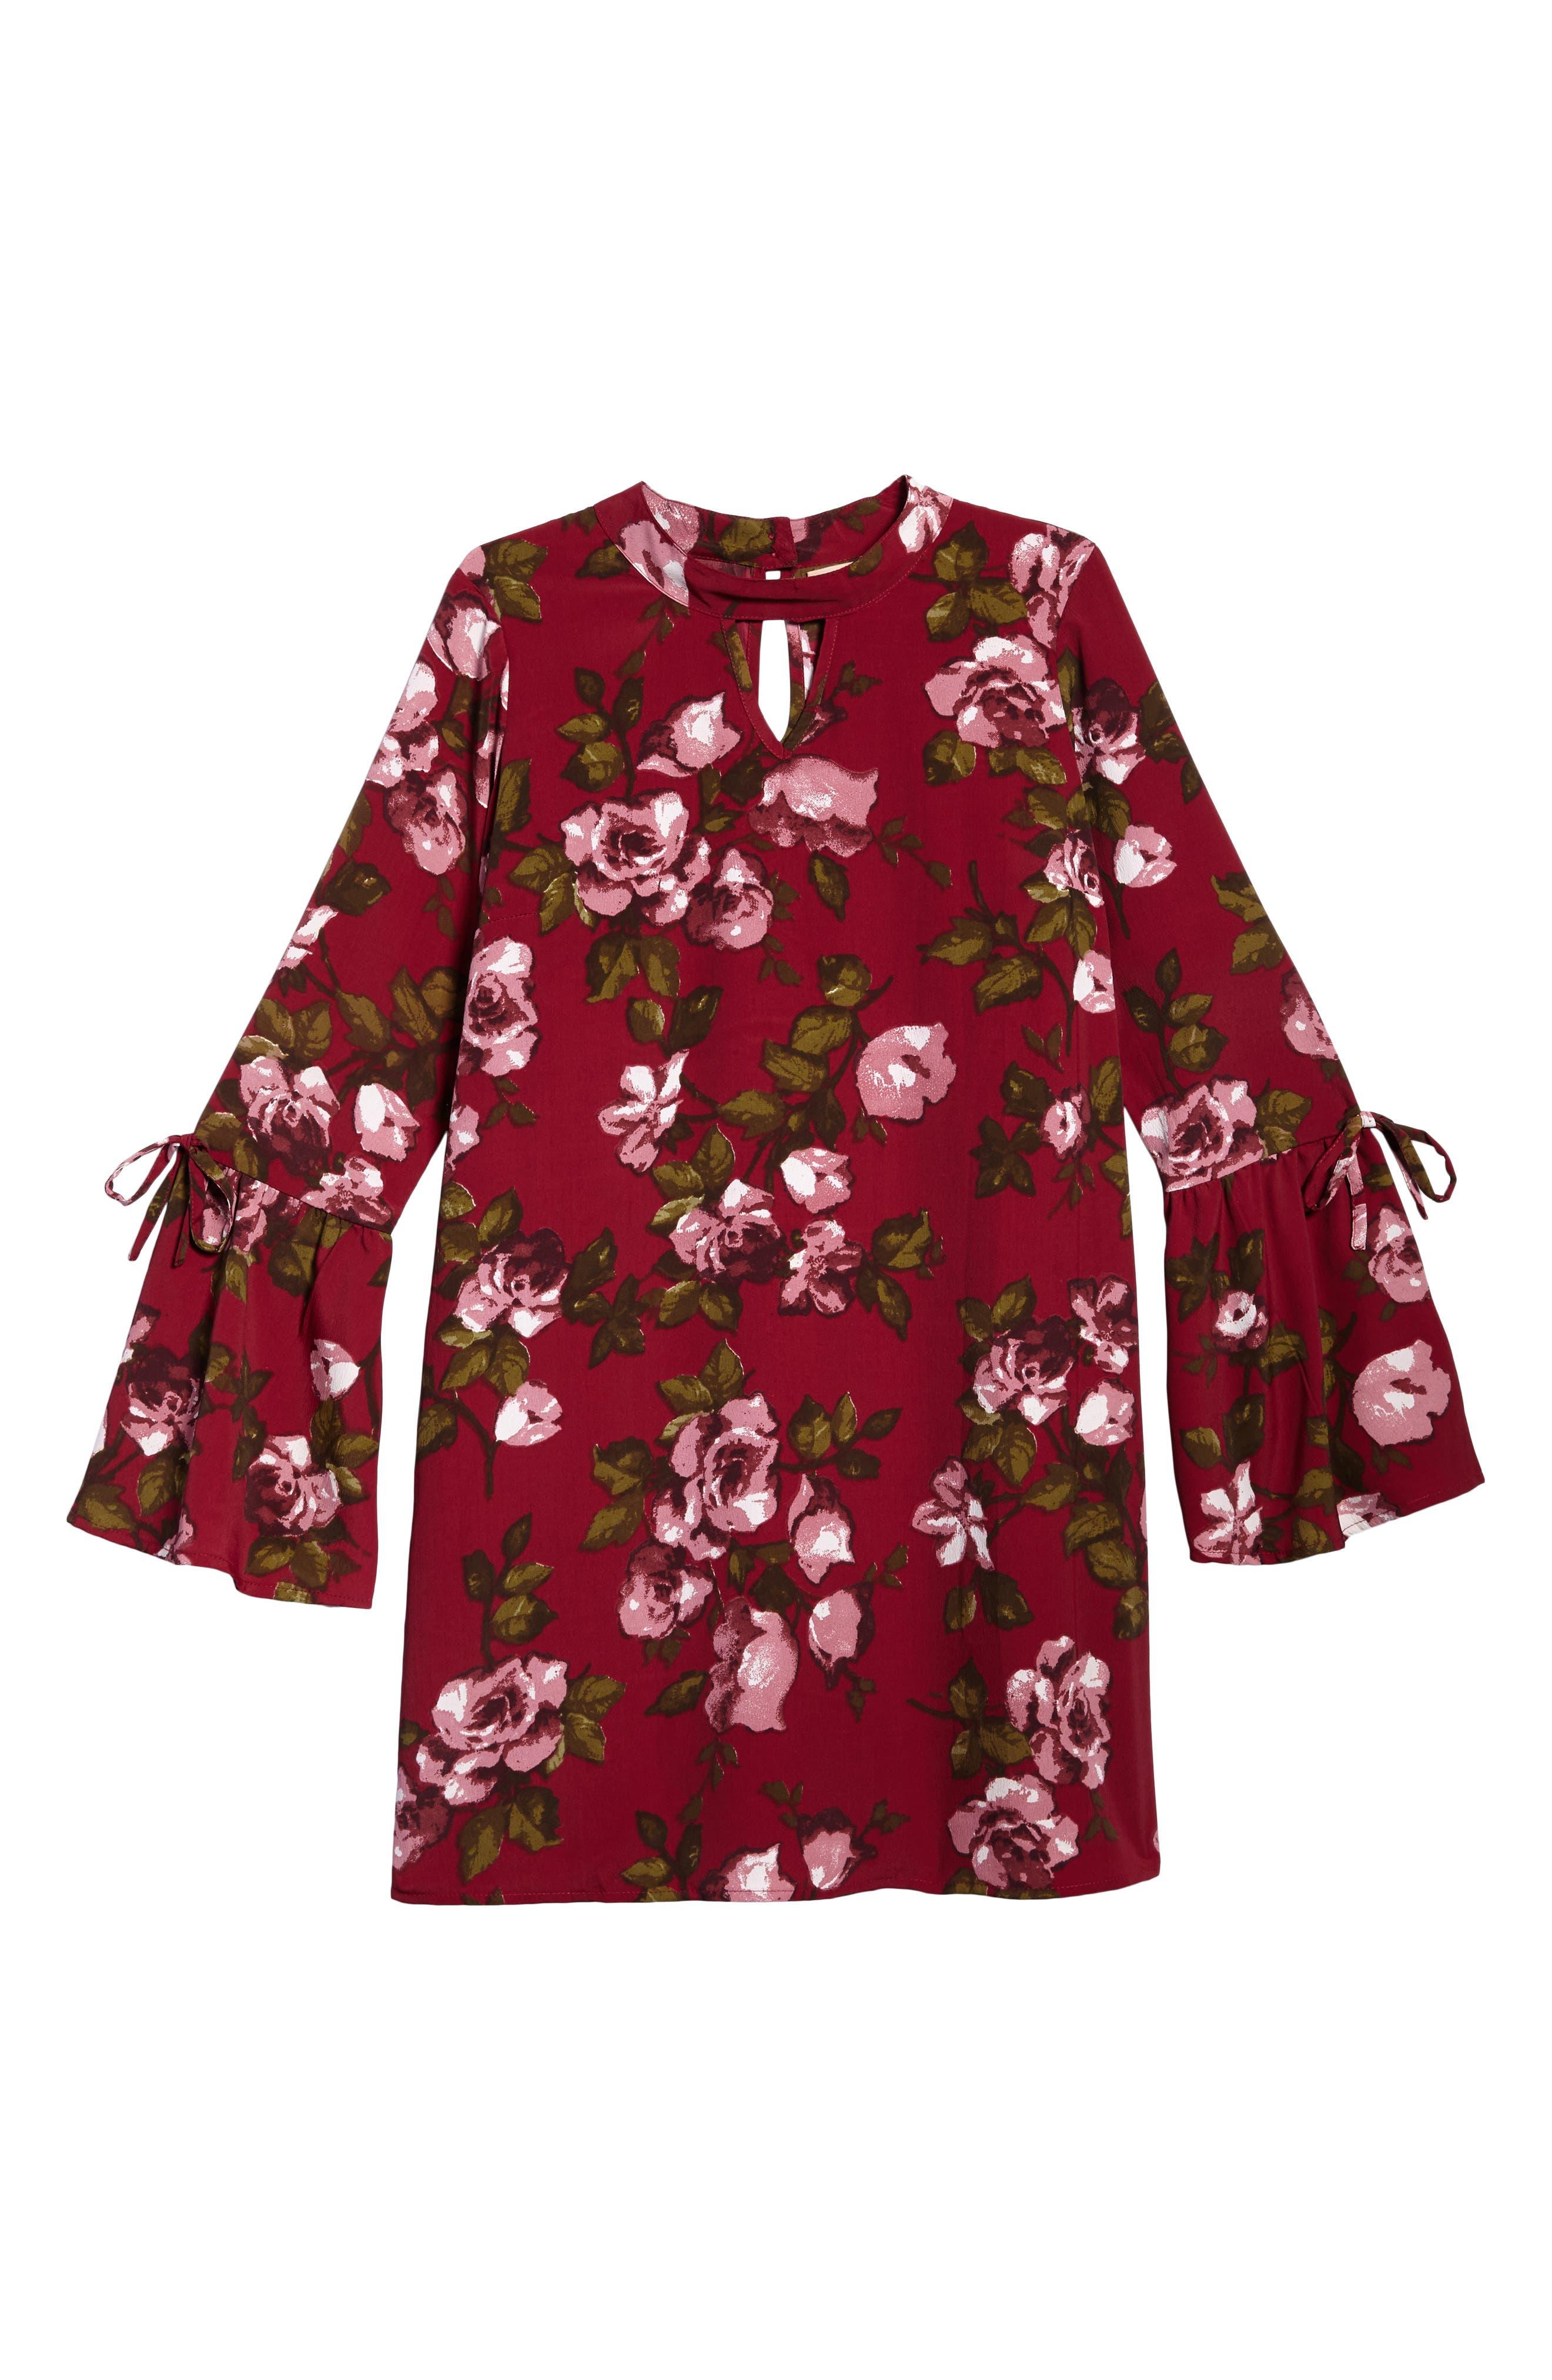 Alternate Image 1 Selected - Zoe and Rose Print Bell Sleeve Dress (Big Girls)